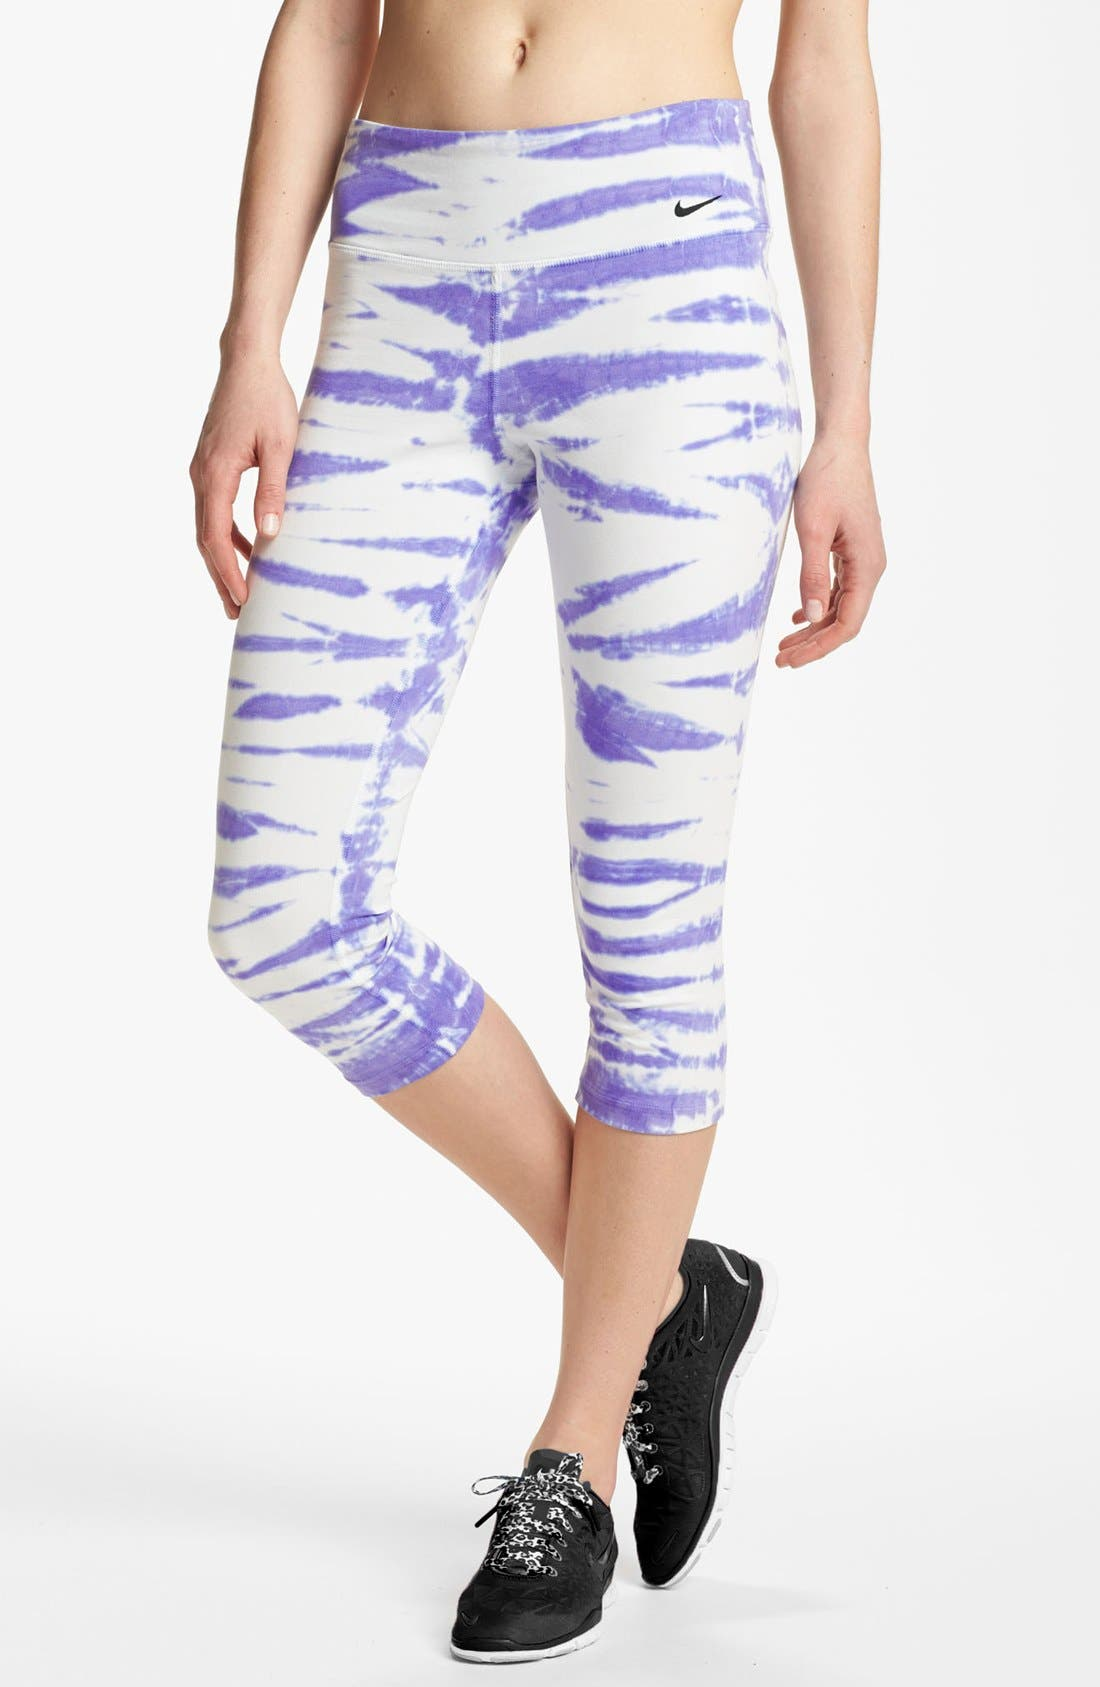 Alternate Image 1 Selected - Nike 'Twist Tie' Dri-FIT Cotton Capri Pants